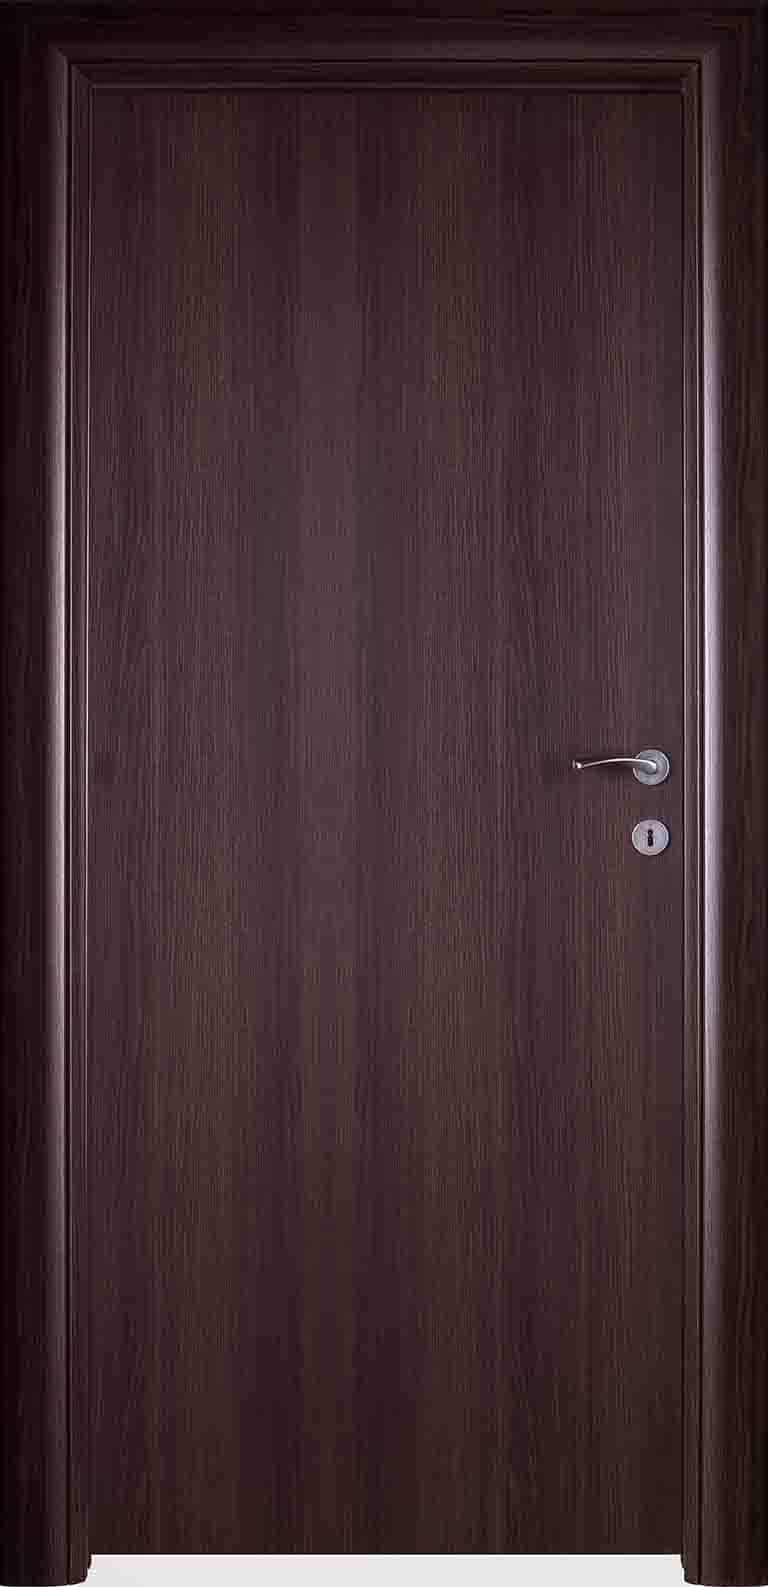 protuprovalna vrata forlux wenge